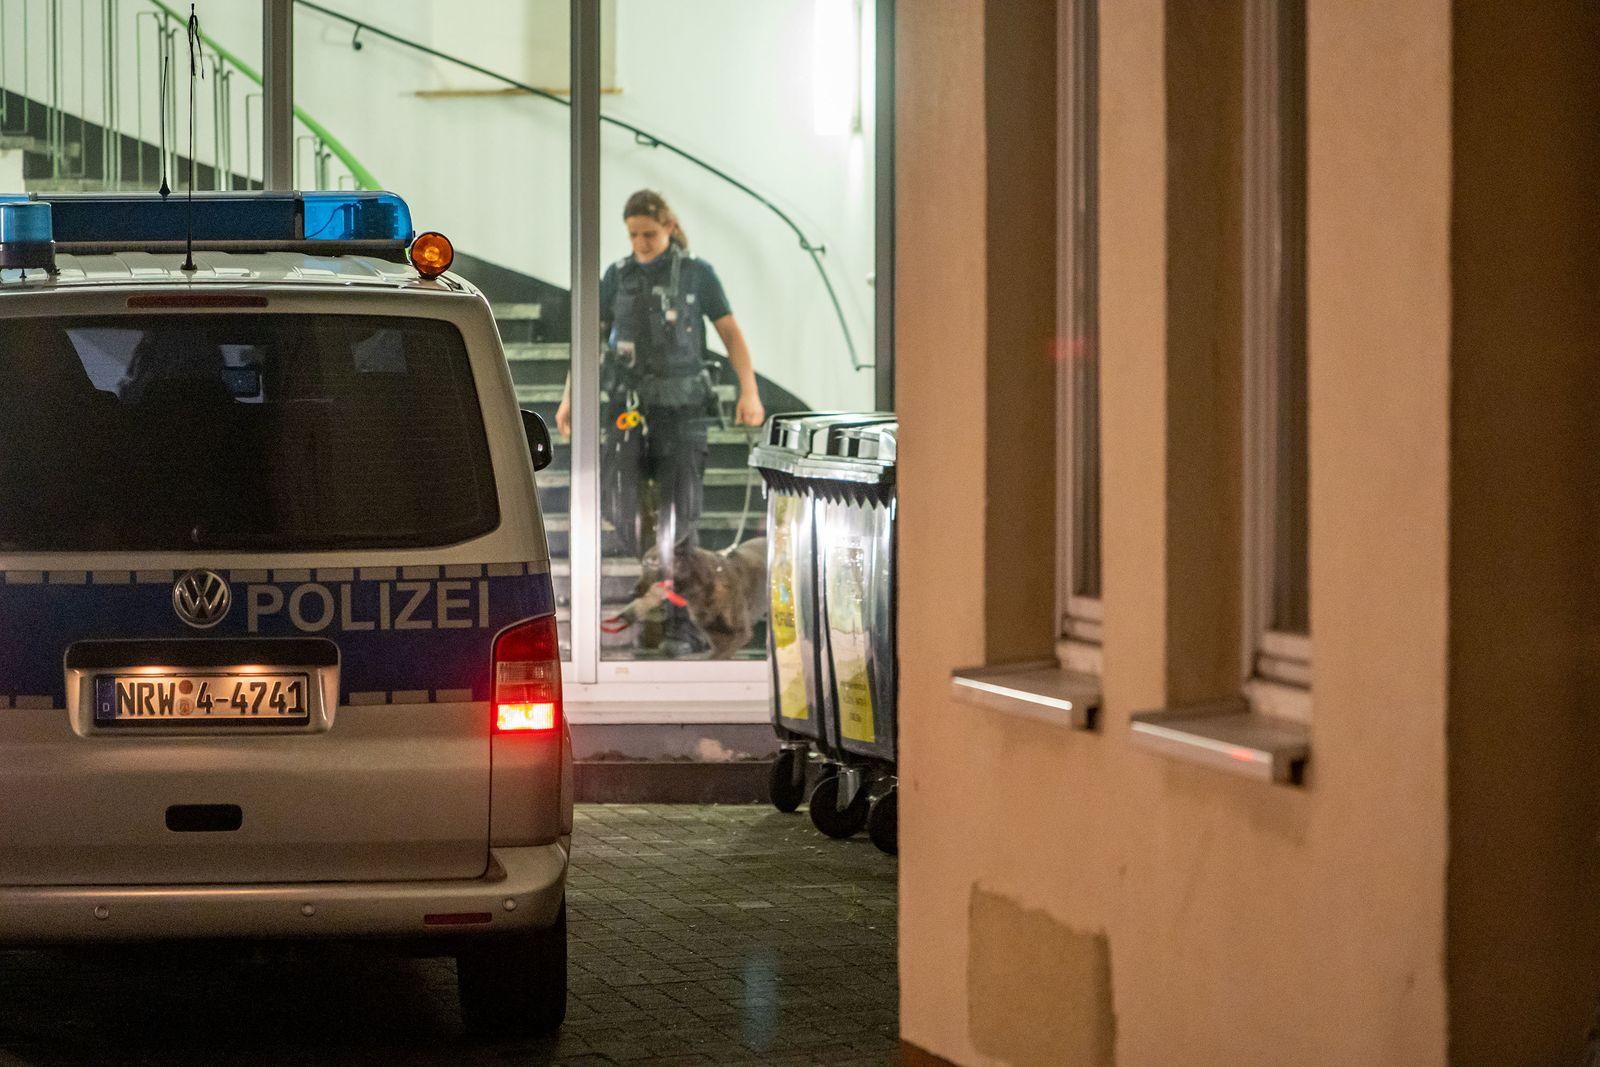 Gesundheitsamt in Olpe nach Bombendrohung geräumt